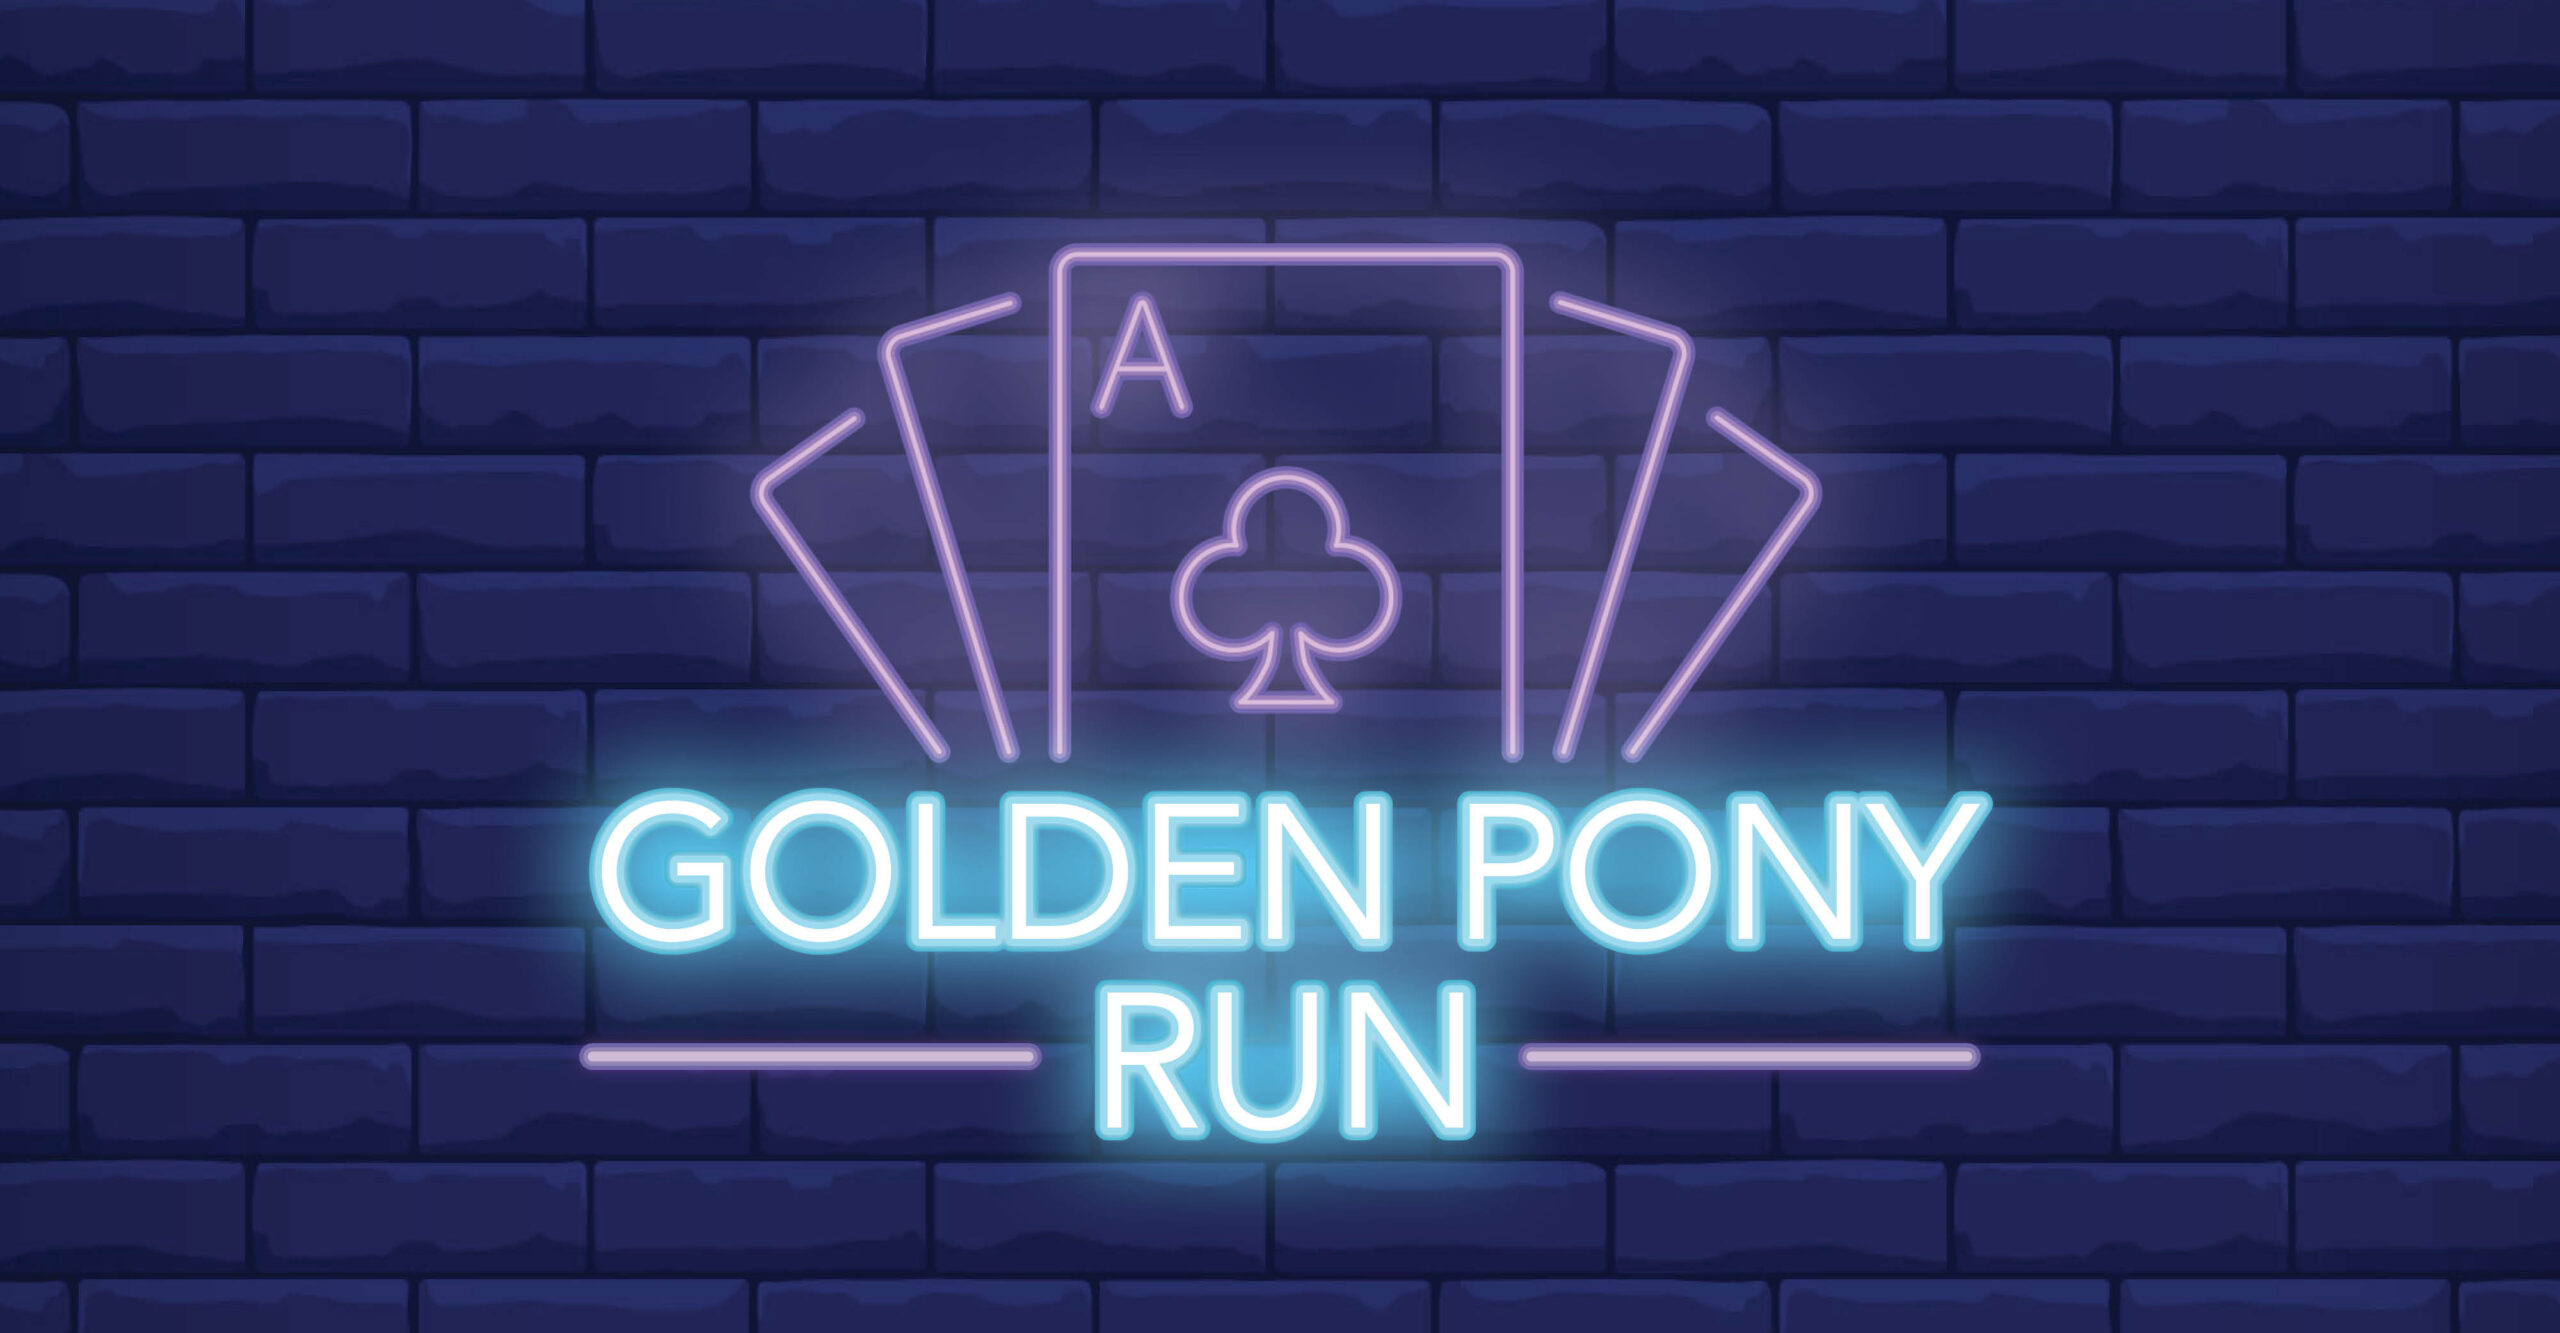 Golden Pony Run